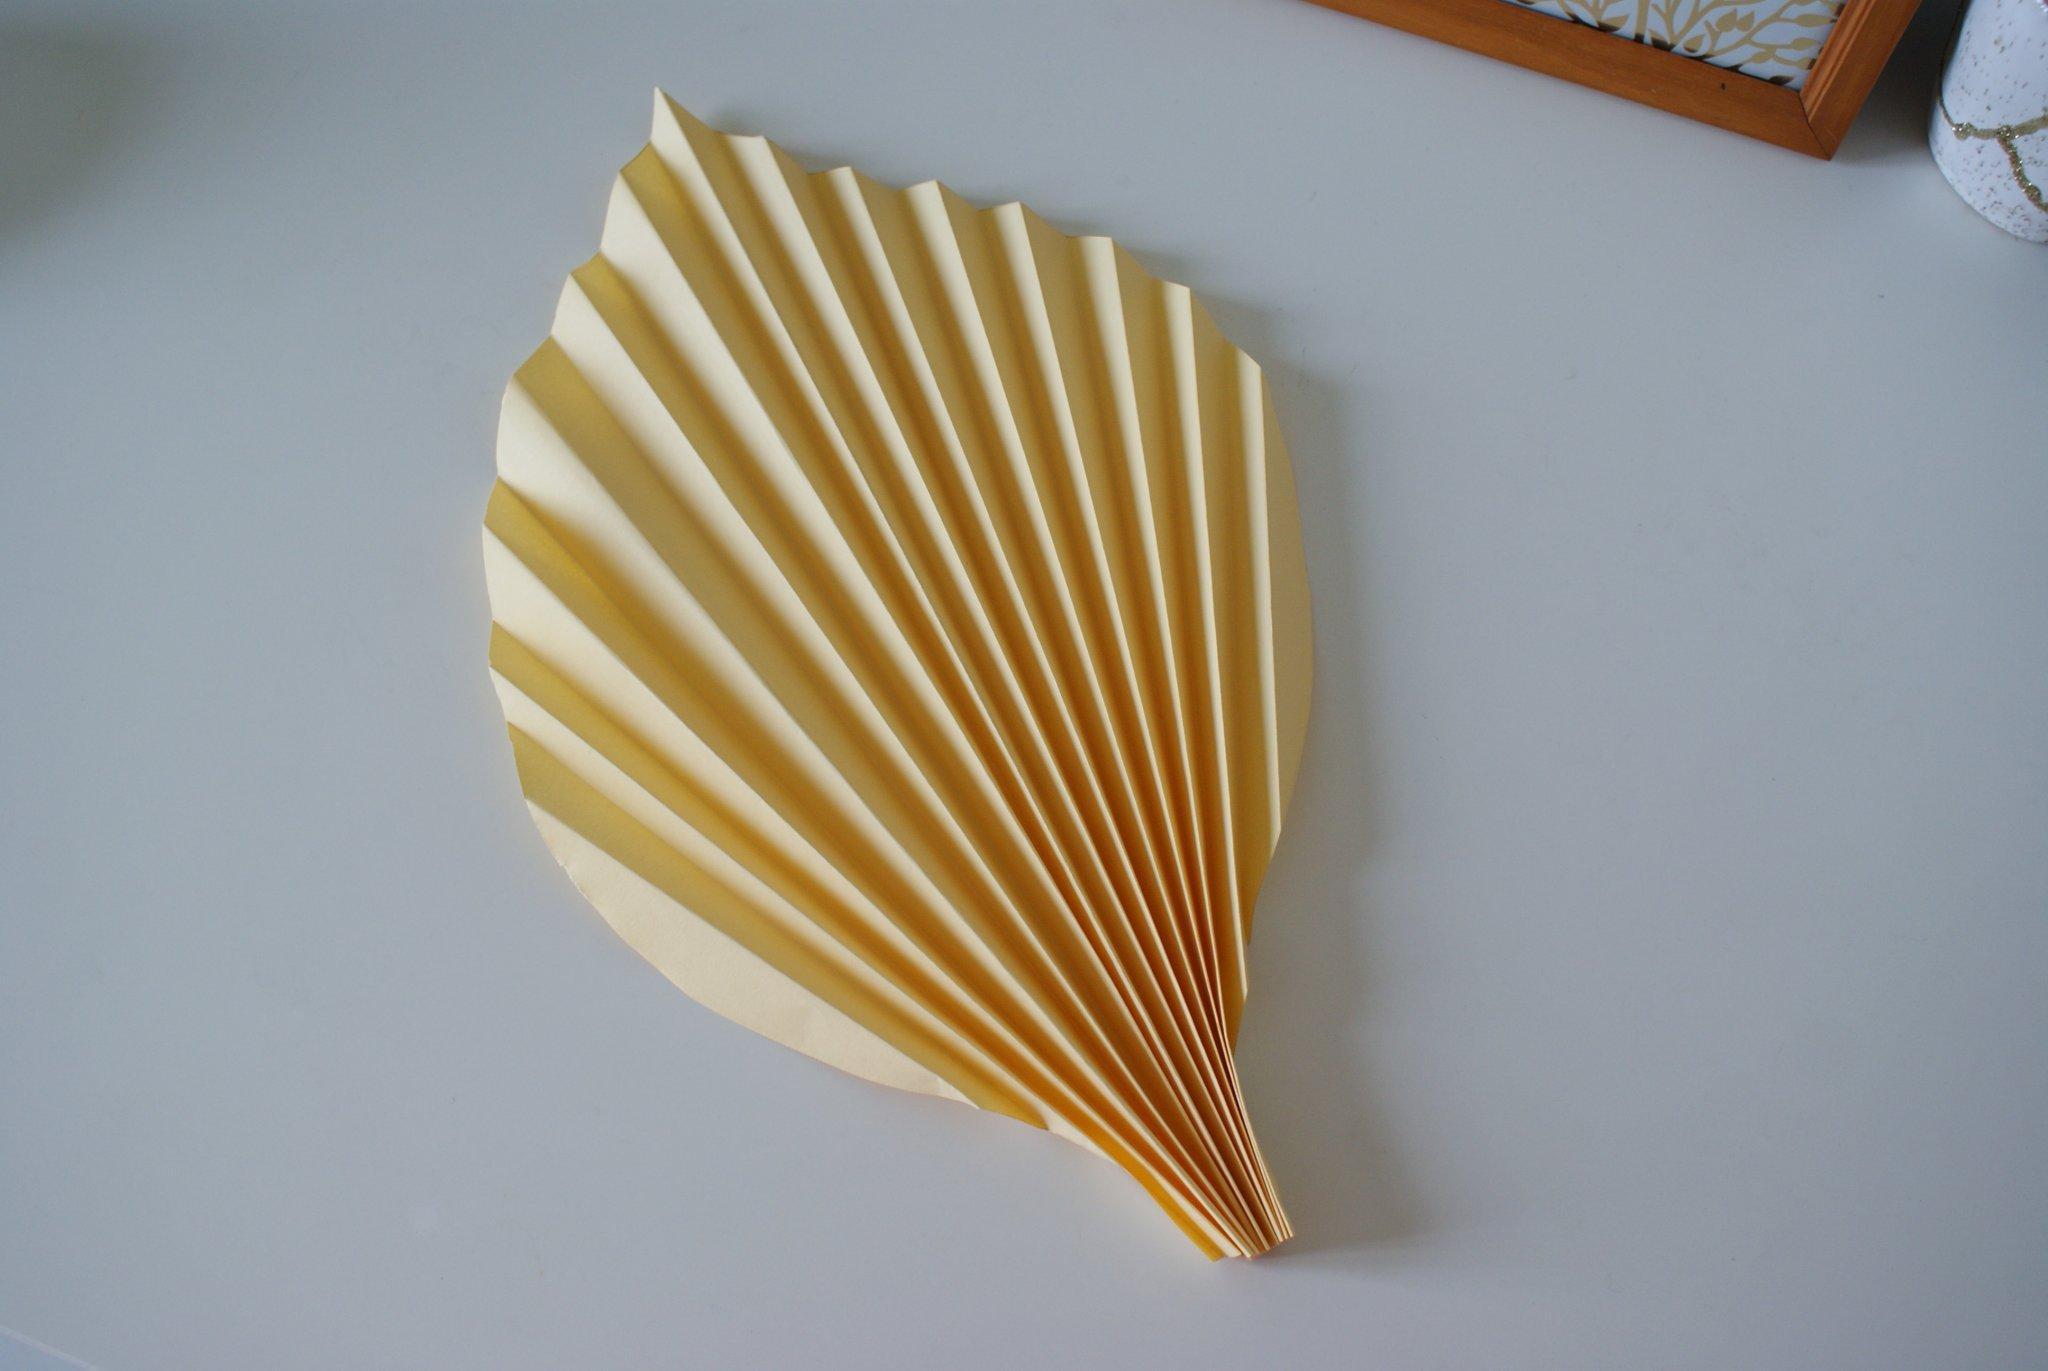 diy palm paper leaf leaves decor idea handmade craft easy simple tutorial home decoration neutral minimalist francinesplaceblog step 6